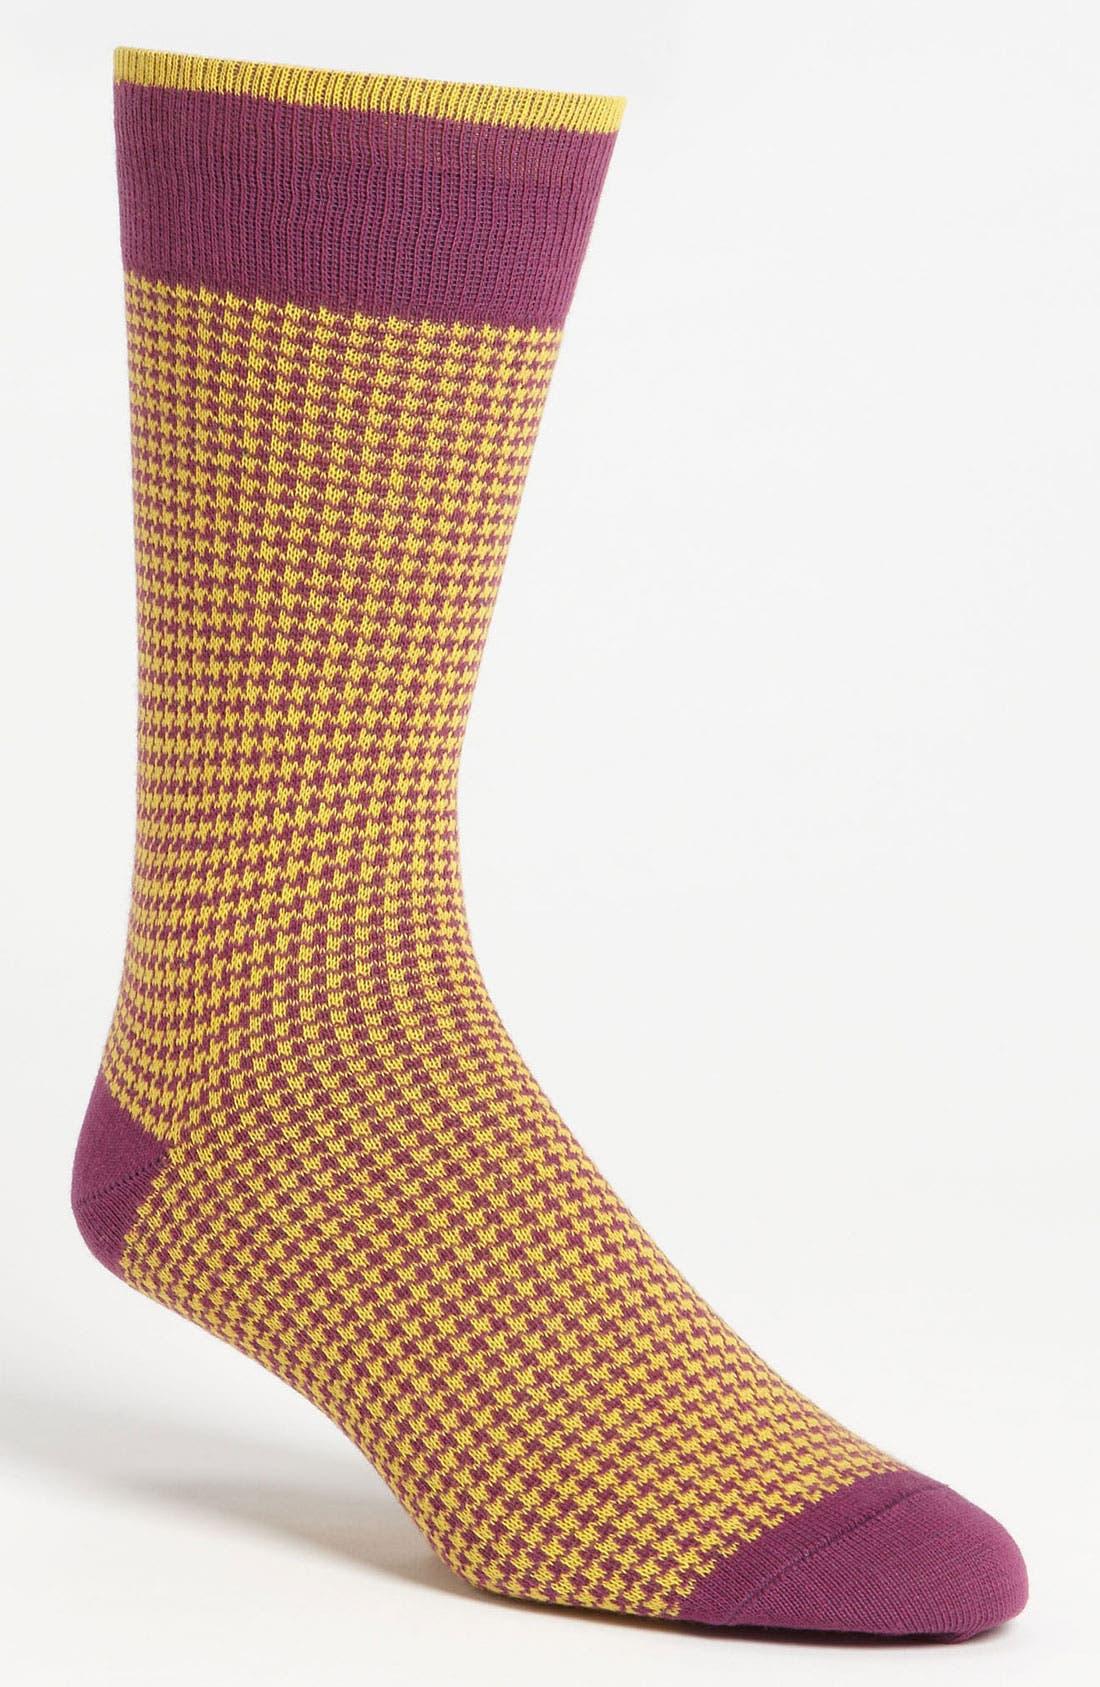 Main Image - Lorenzo Uomo Houndstooth Check Socks